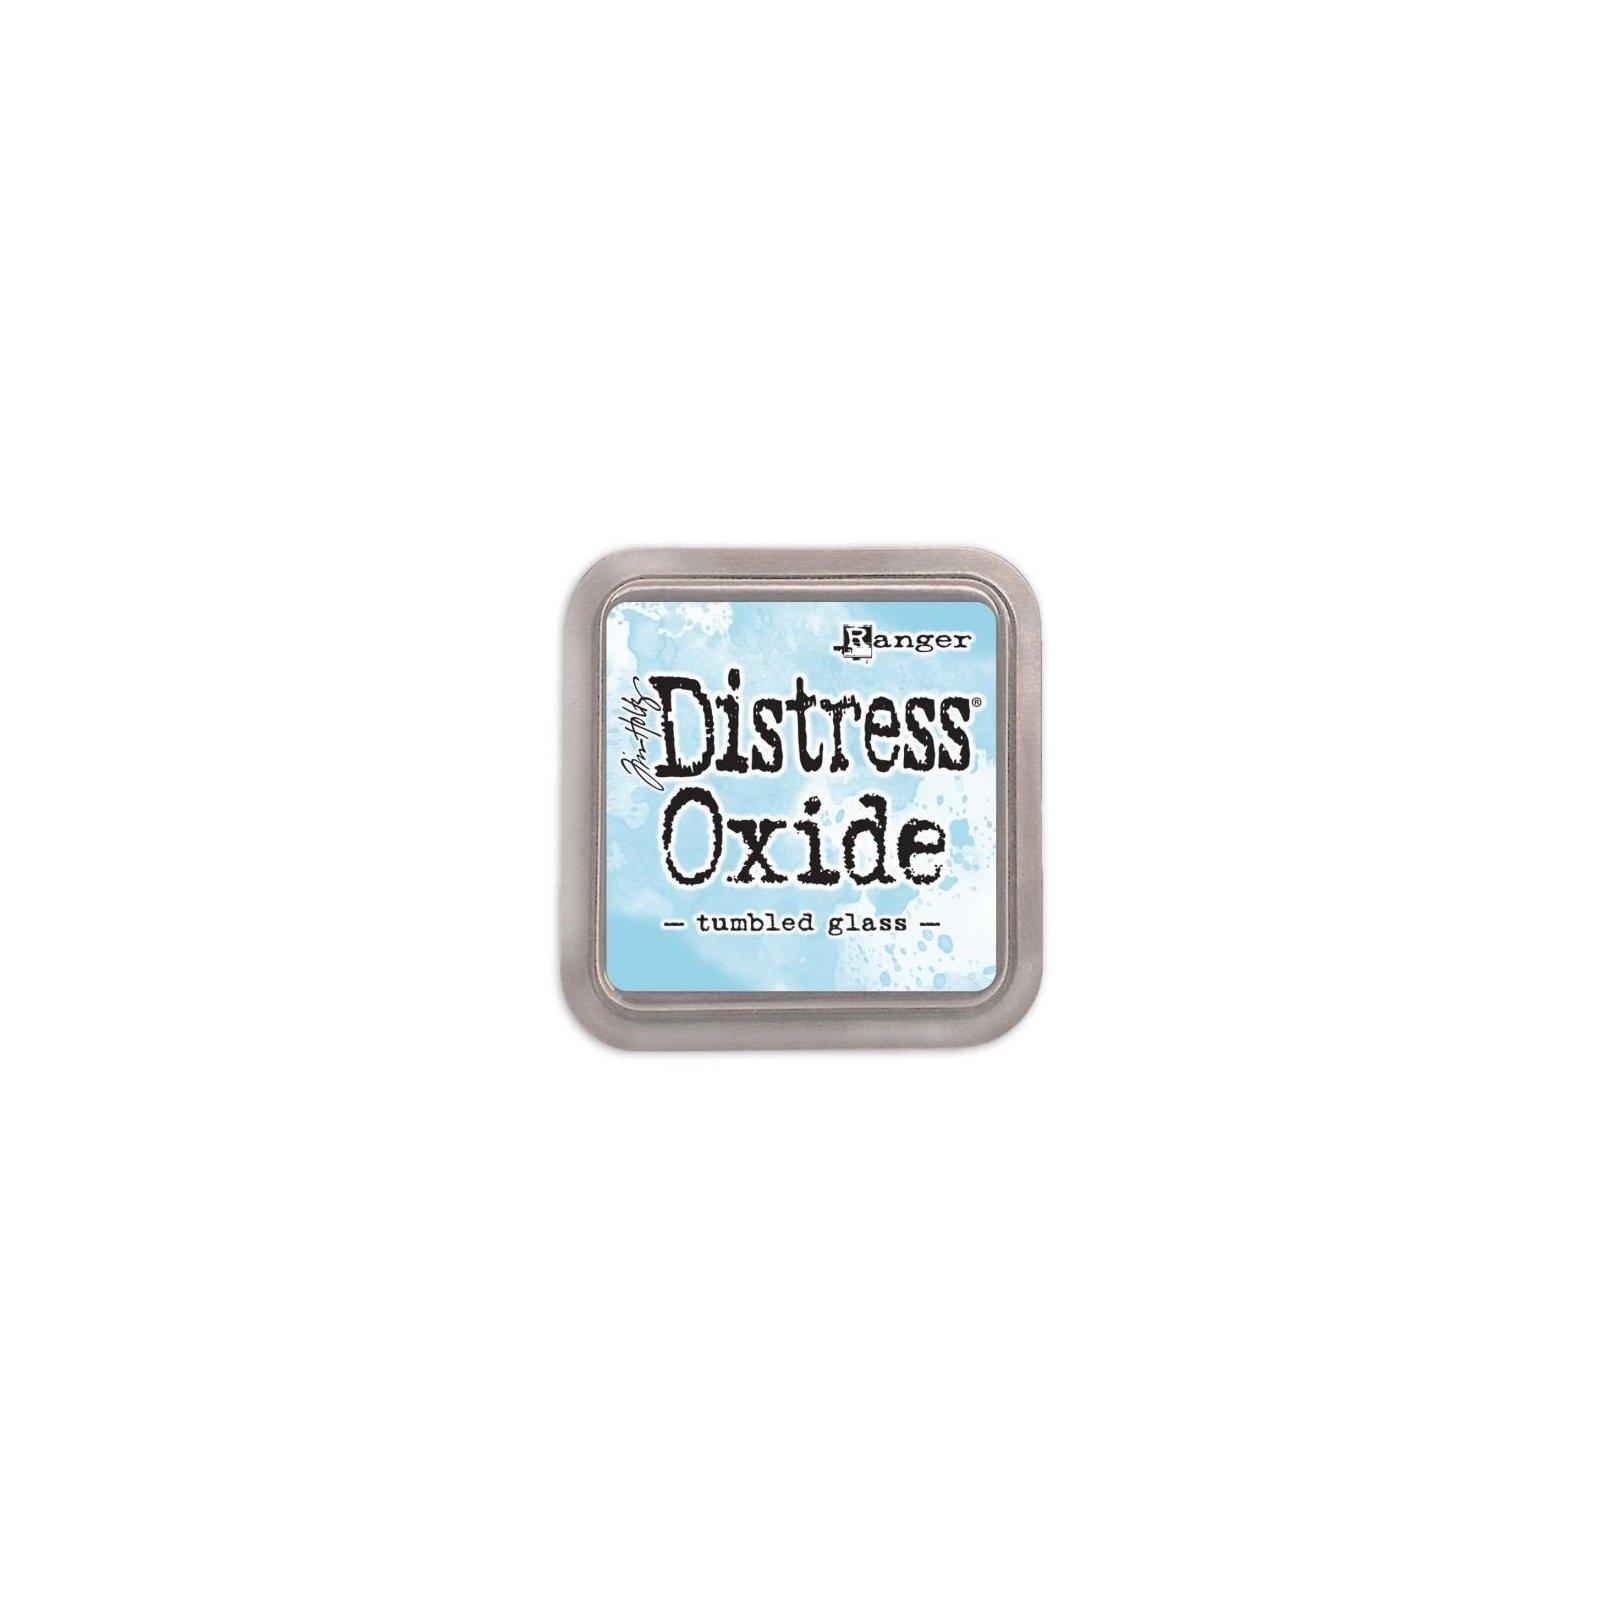 Grand encreur bleu Distress Oxide - Tumbled Glass - Ranger